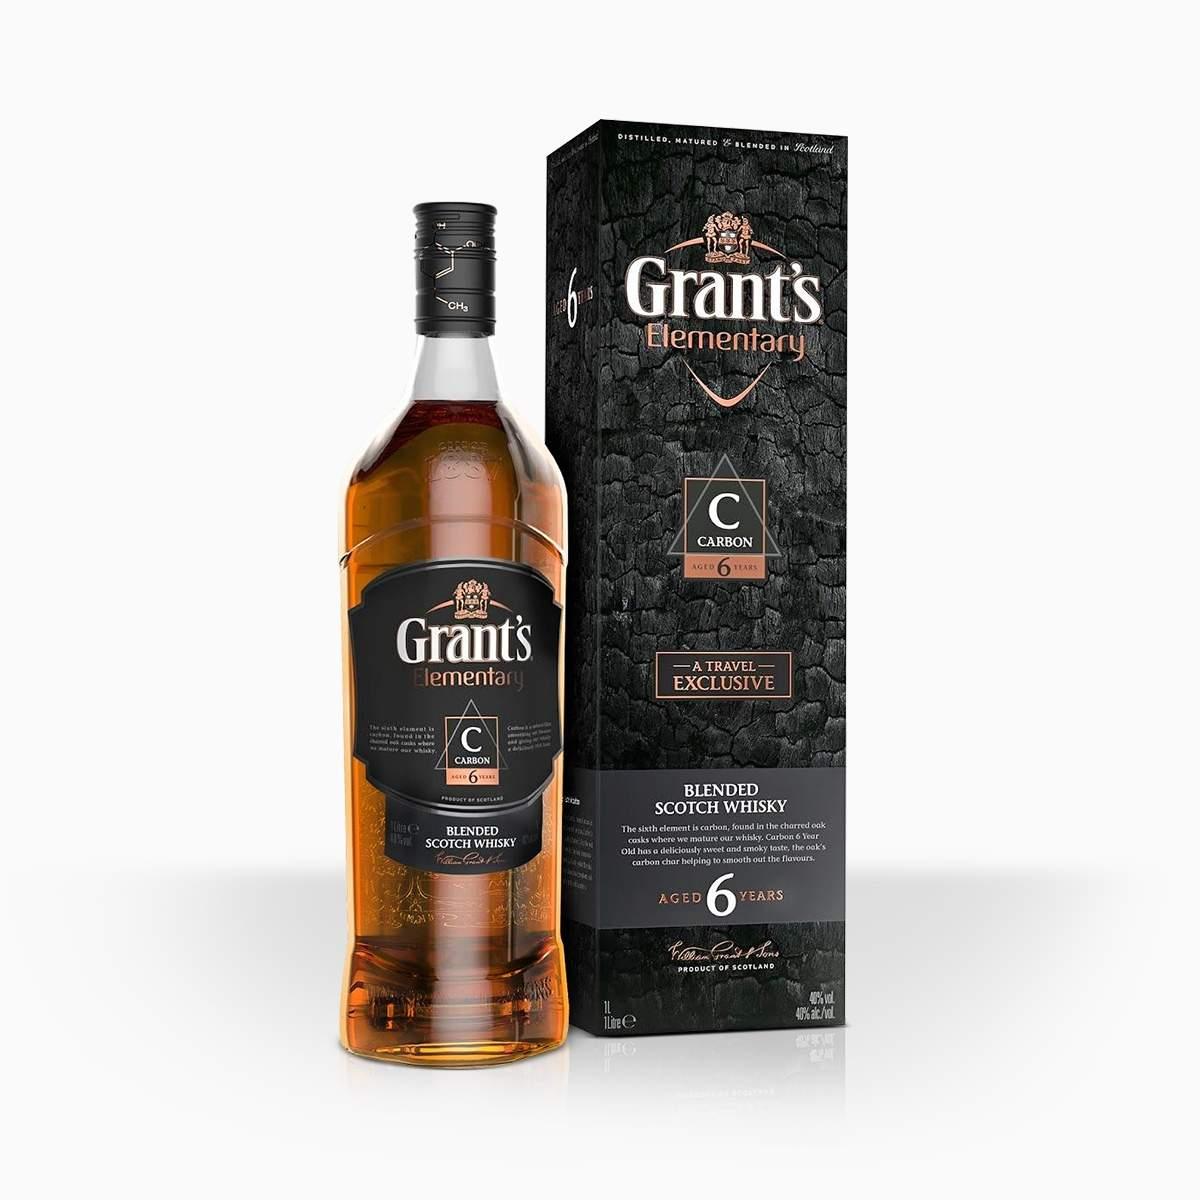 Whisky Grant's Elementary Carbon 6YO 40% 1l